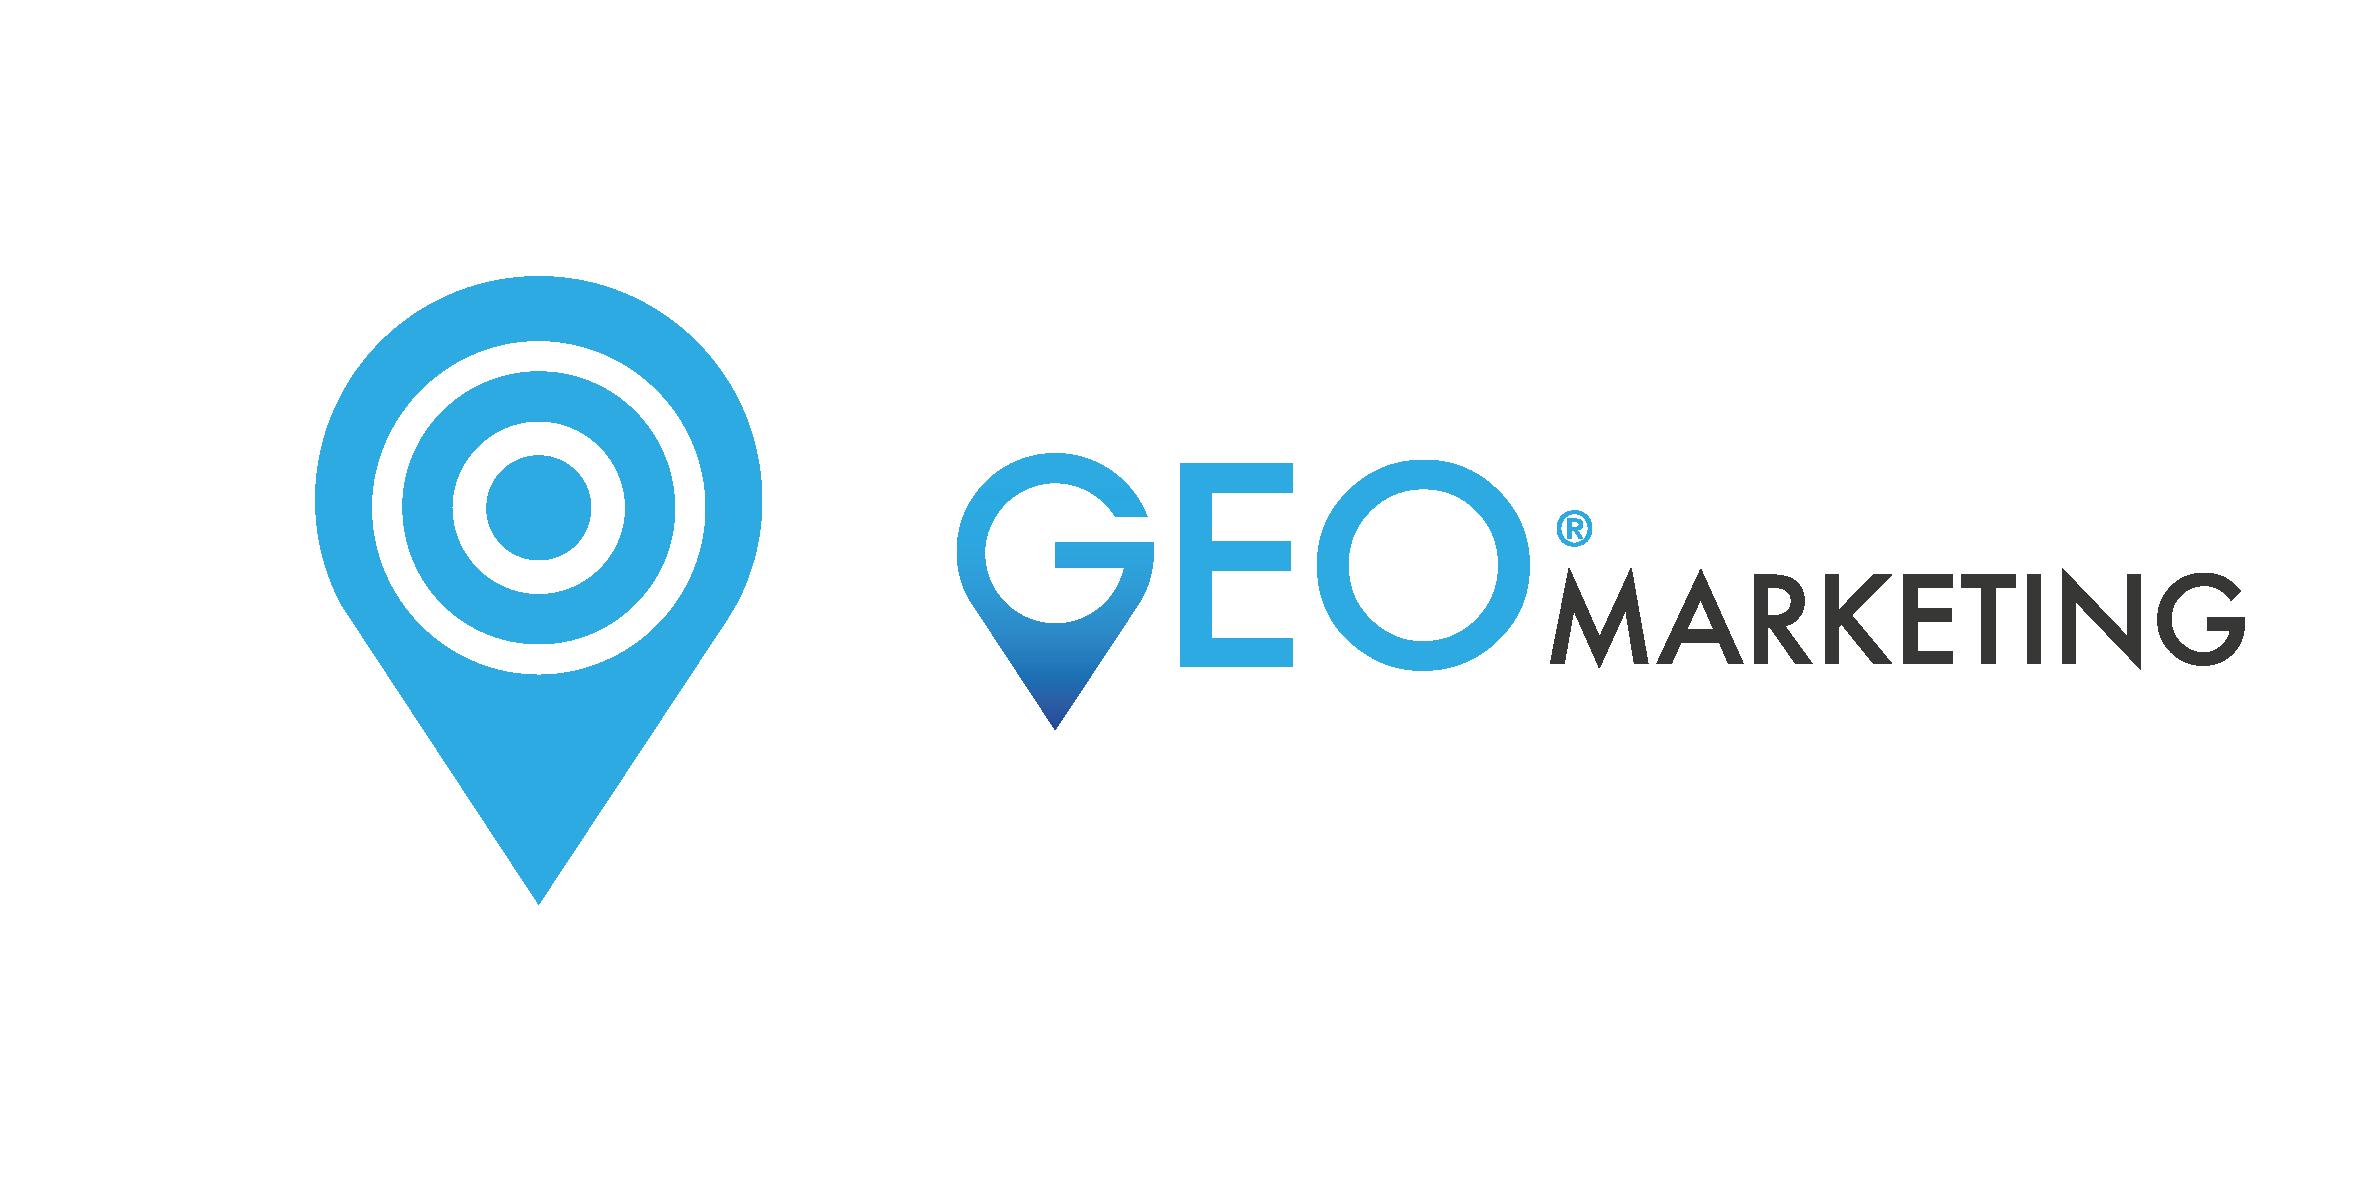 GEO_MARKETING-04